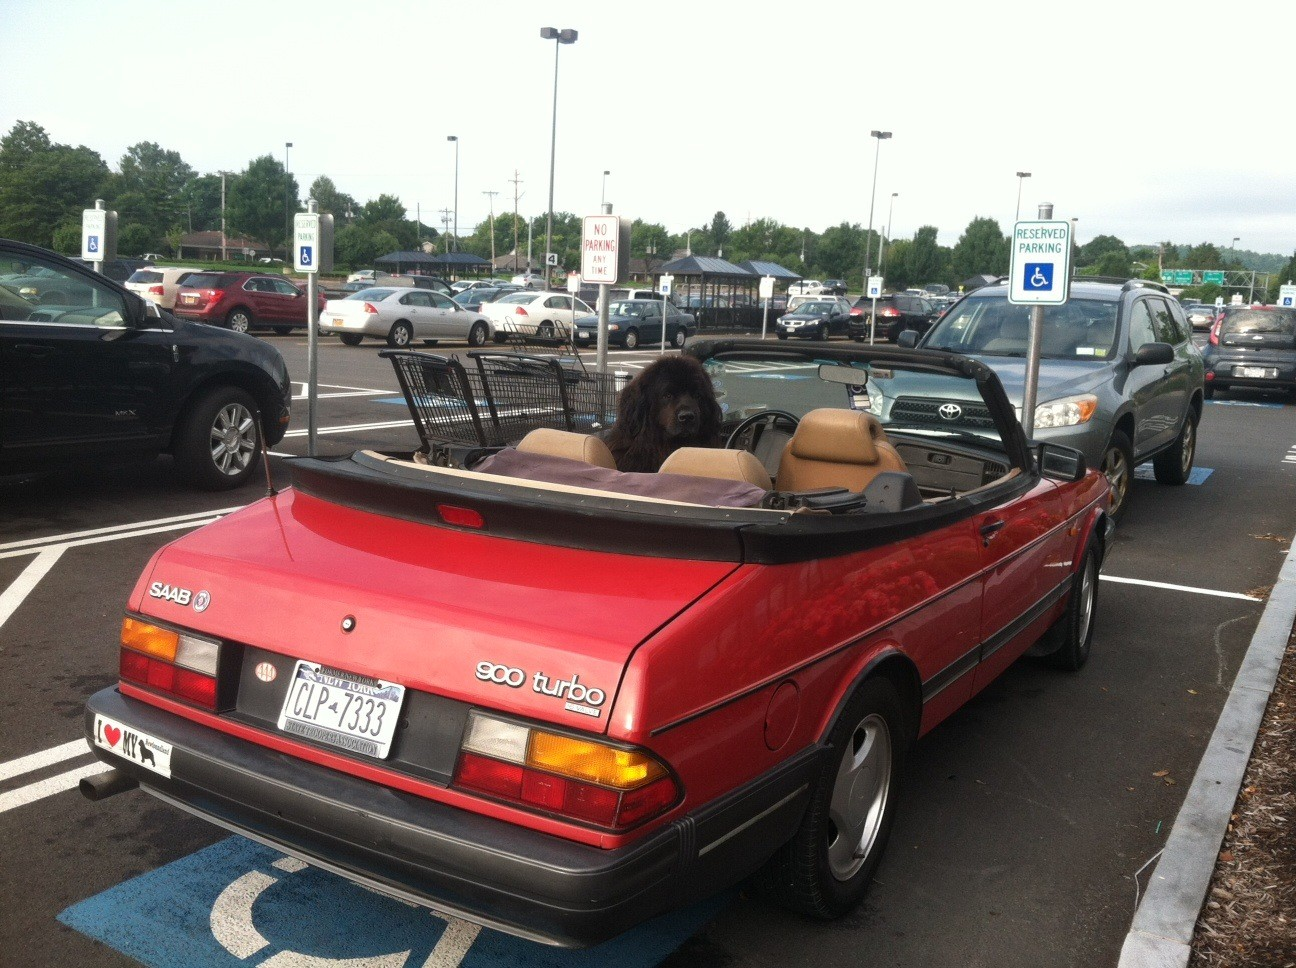 Wegman's Parking Lot, Labor Day Wkend...